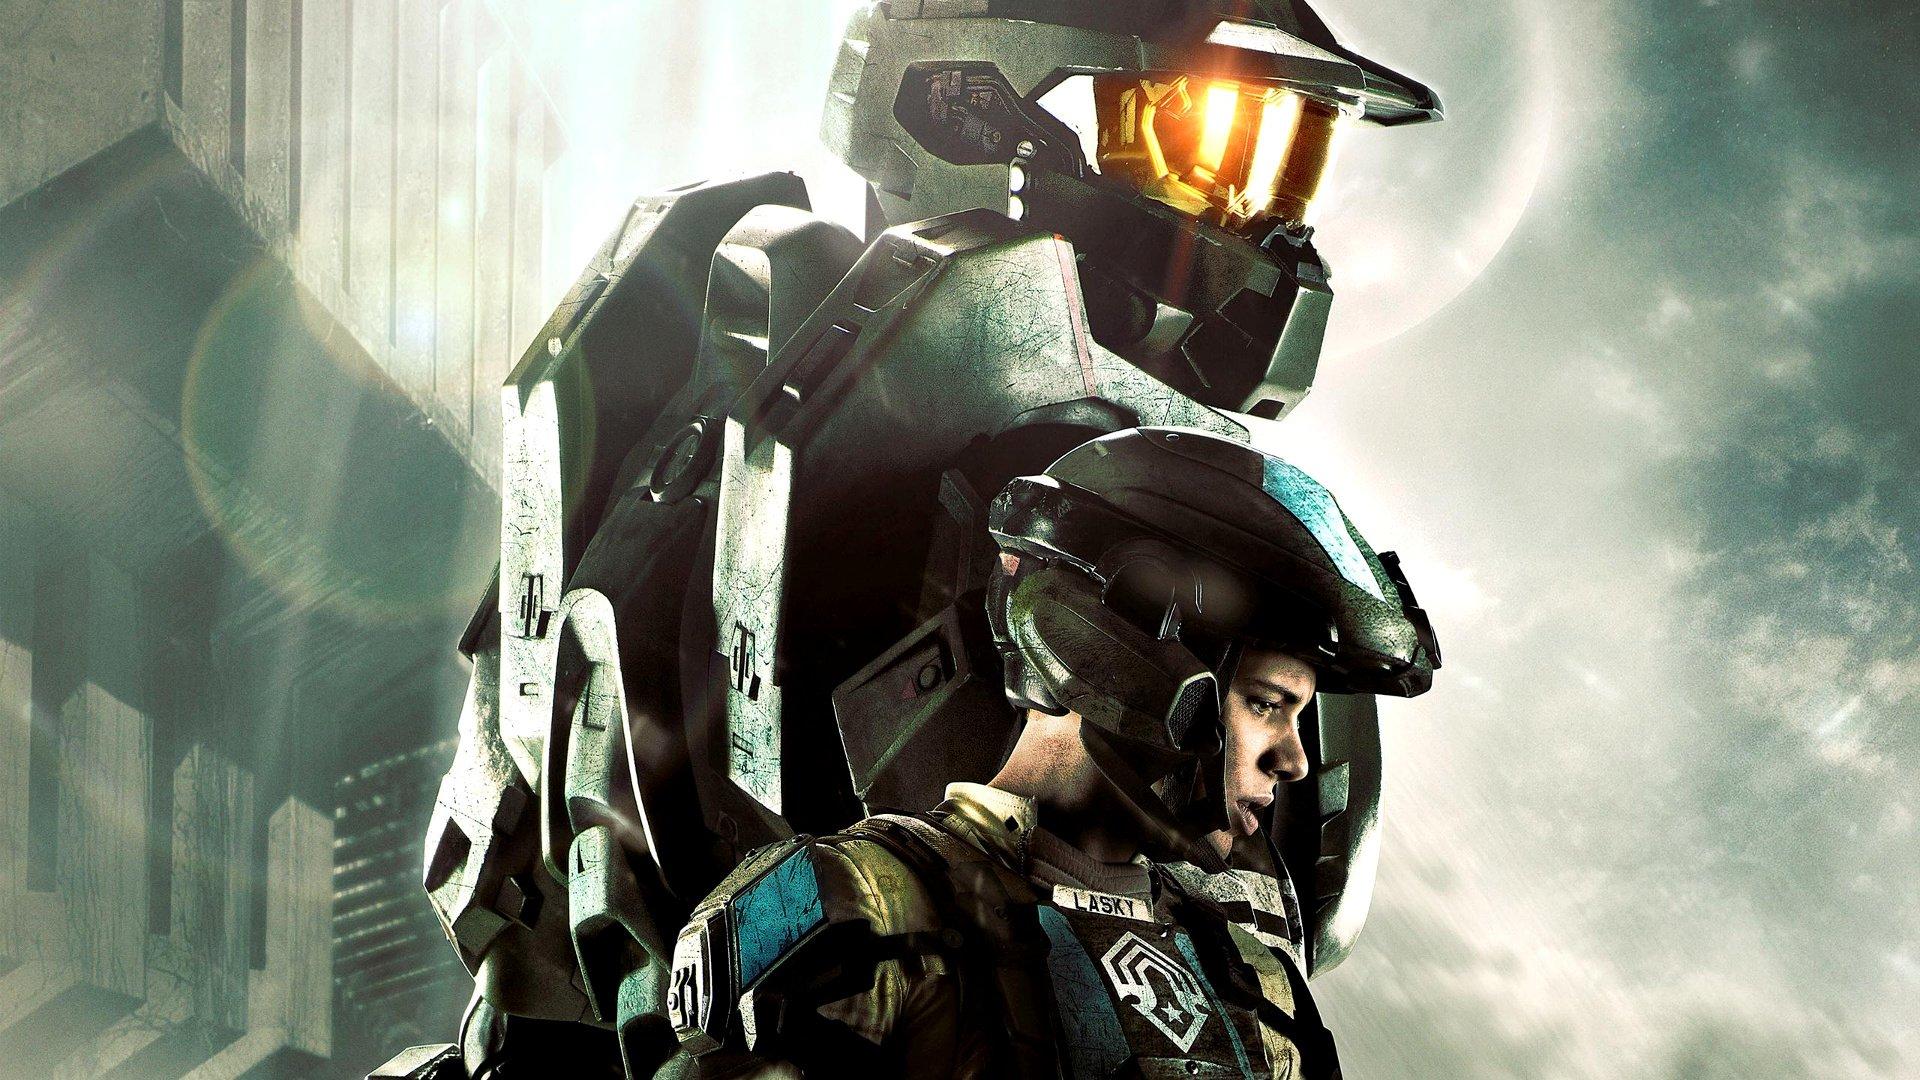 Halo 4 Forward Unto Dawn HD Wallpaper Background Image 1920x1080